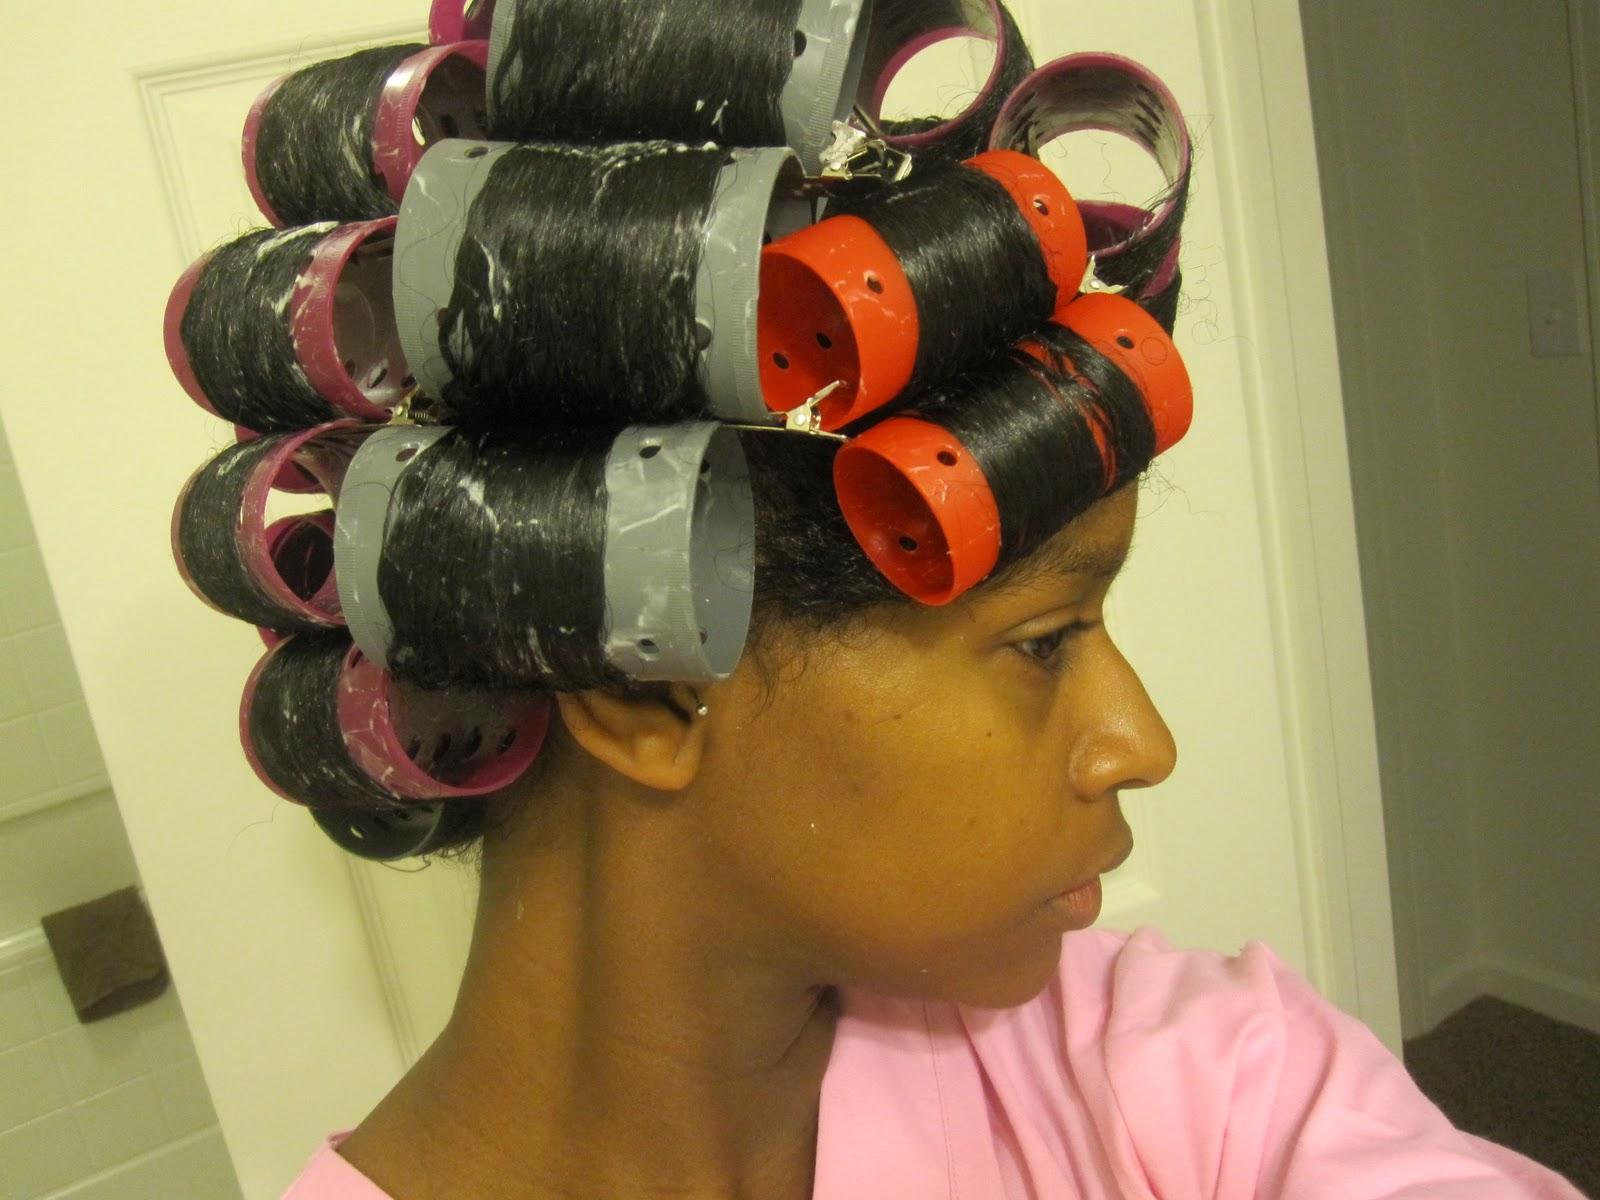 MahoganyCurls' Natural Hair Roller Set - Strawberricurls